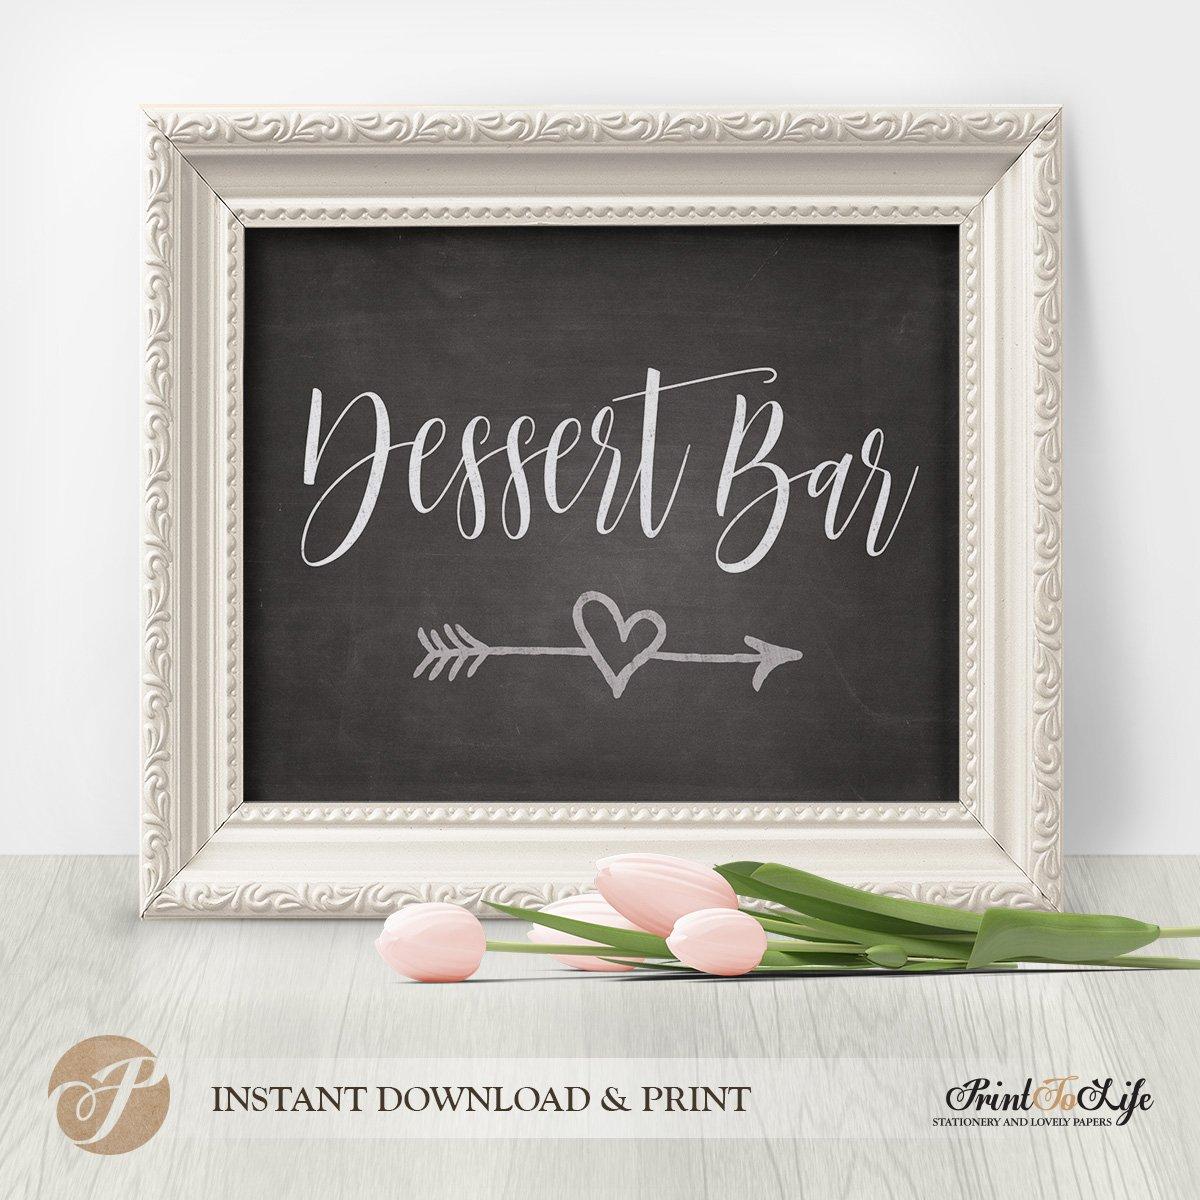 dessert bar sign